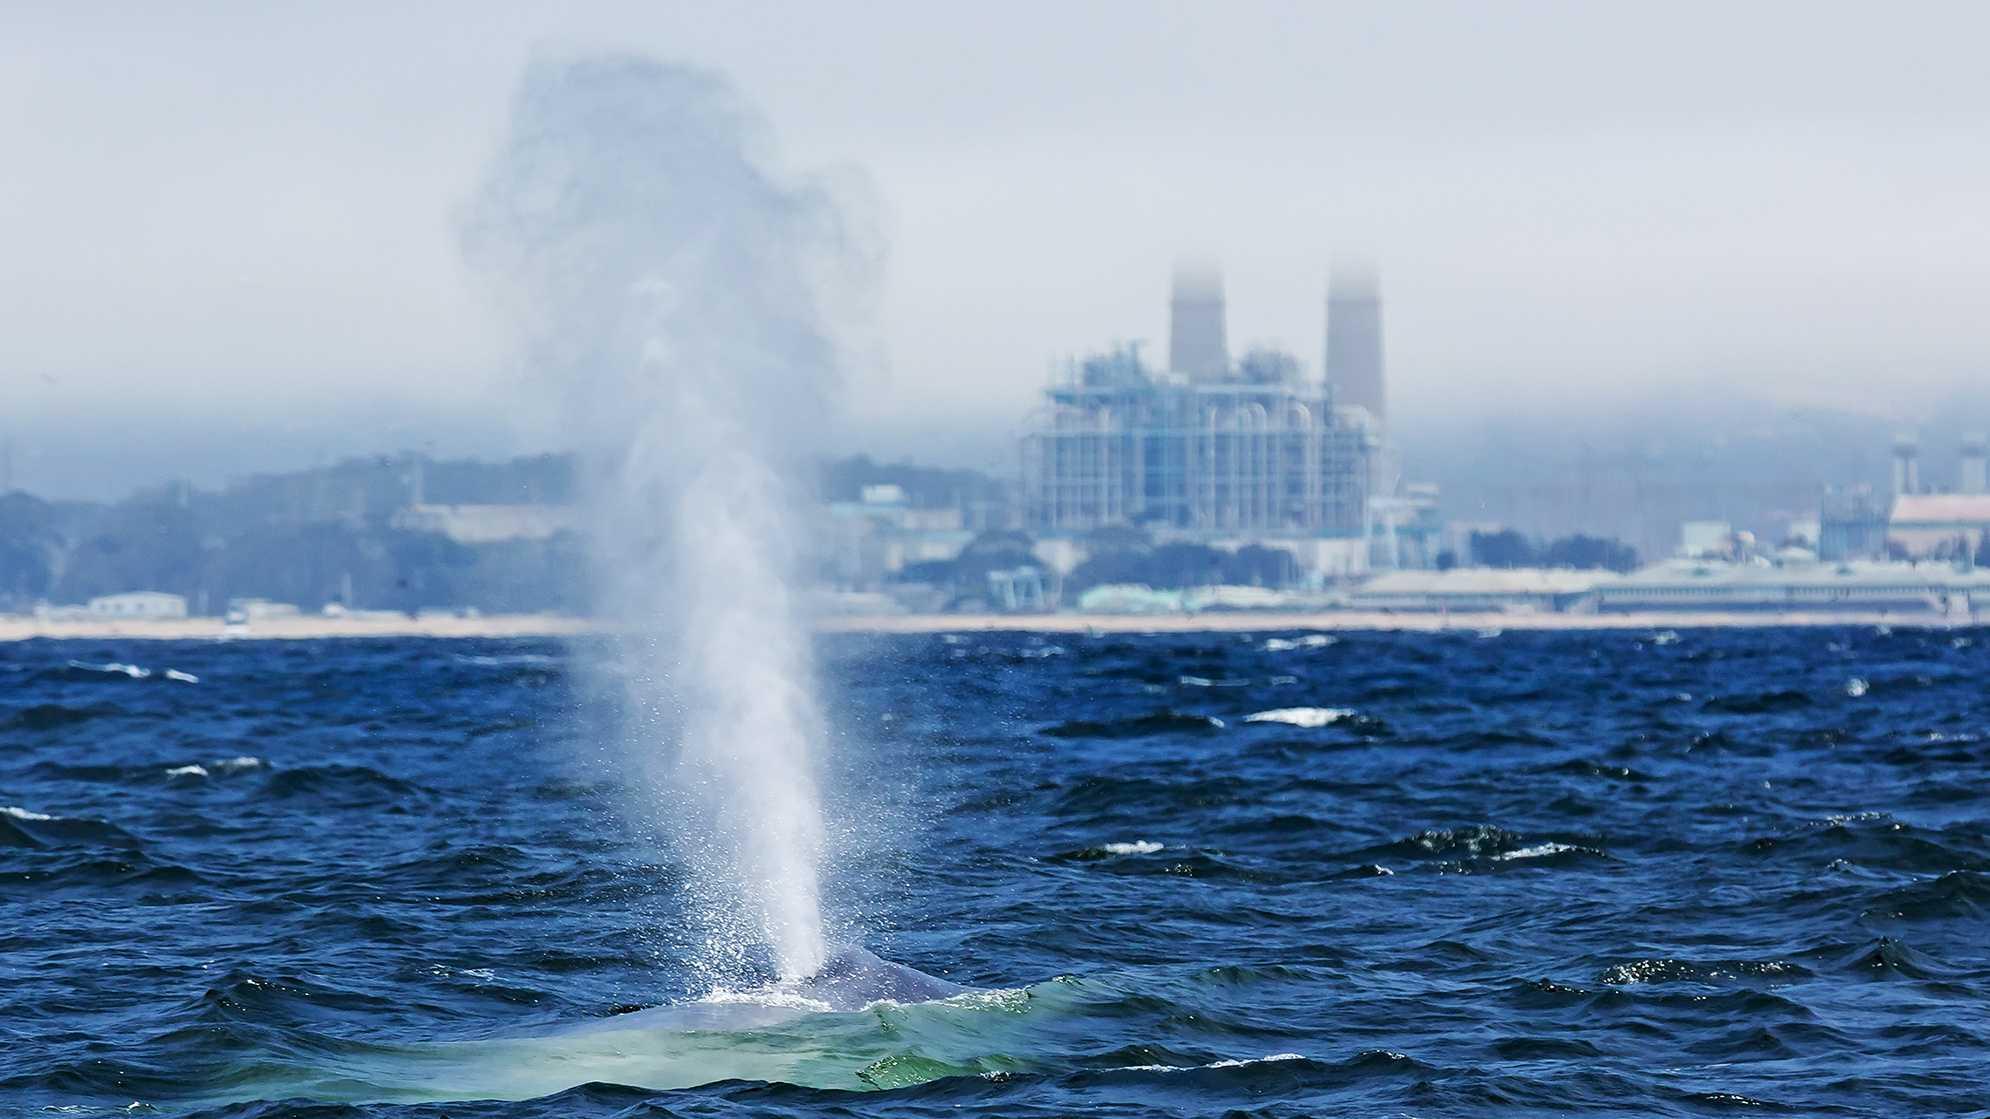 A blue whale spouts as it swims past the Moss Landing power plant.